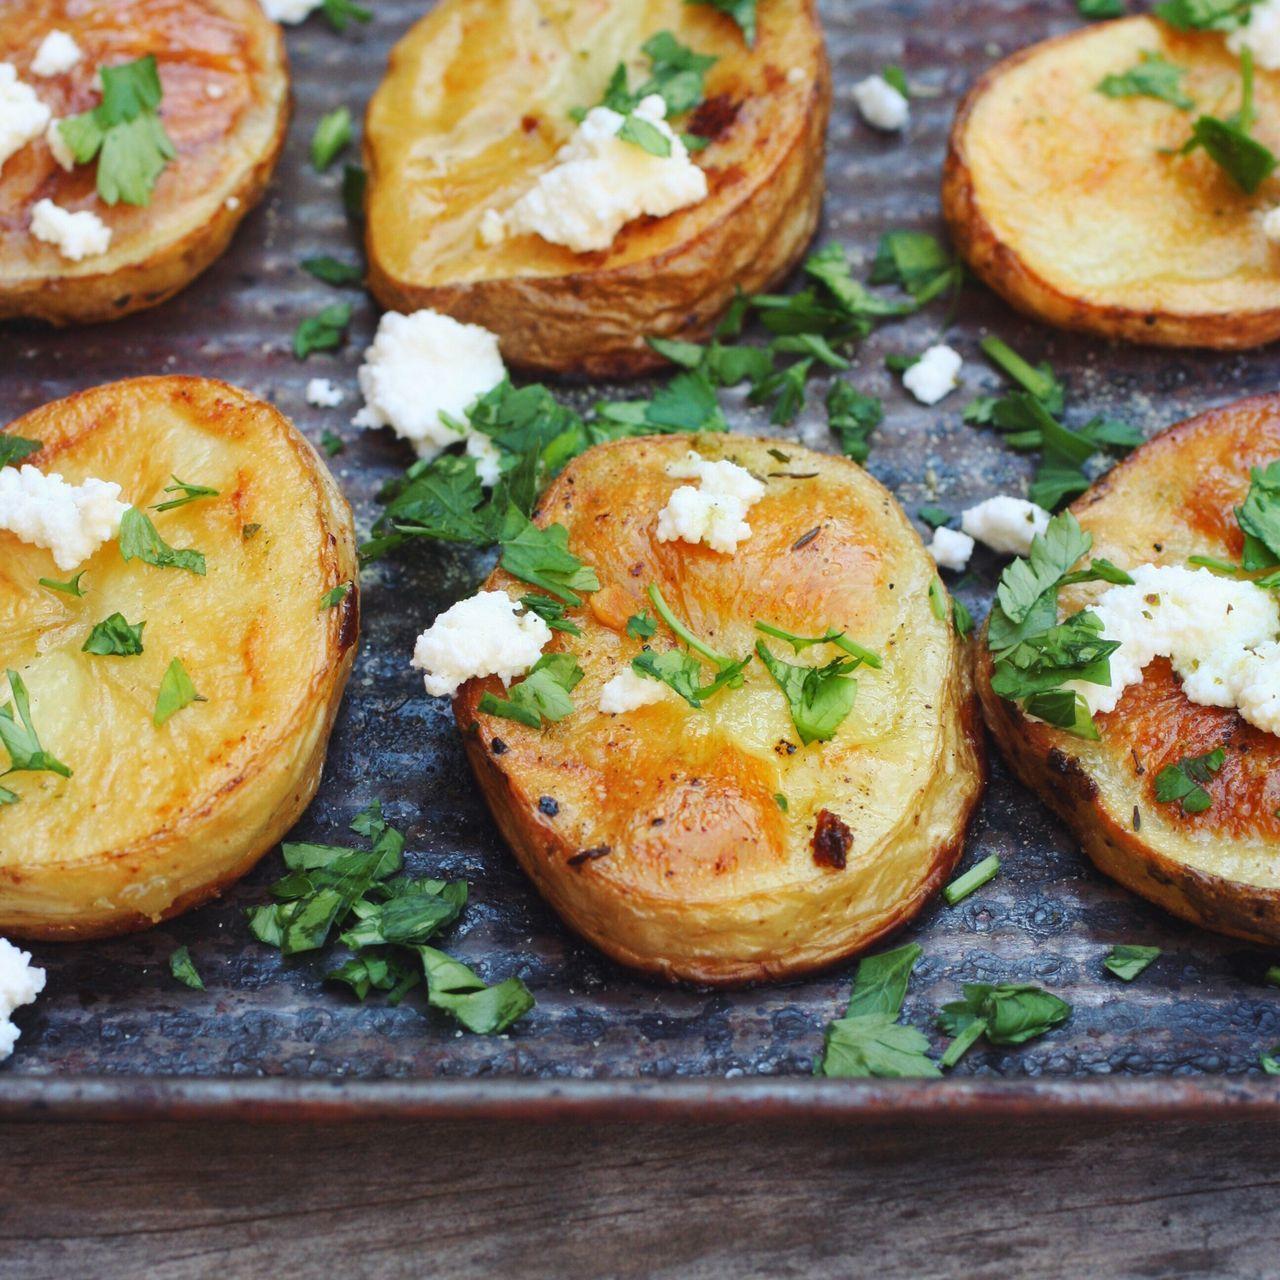 Roasted Potatoes Parsley Thyme Oliveoil Feta Cheese